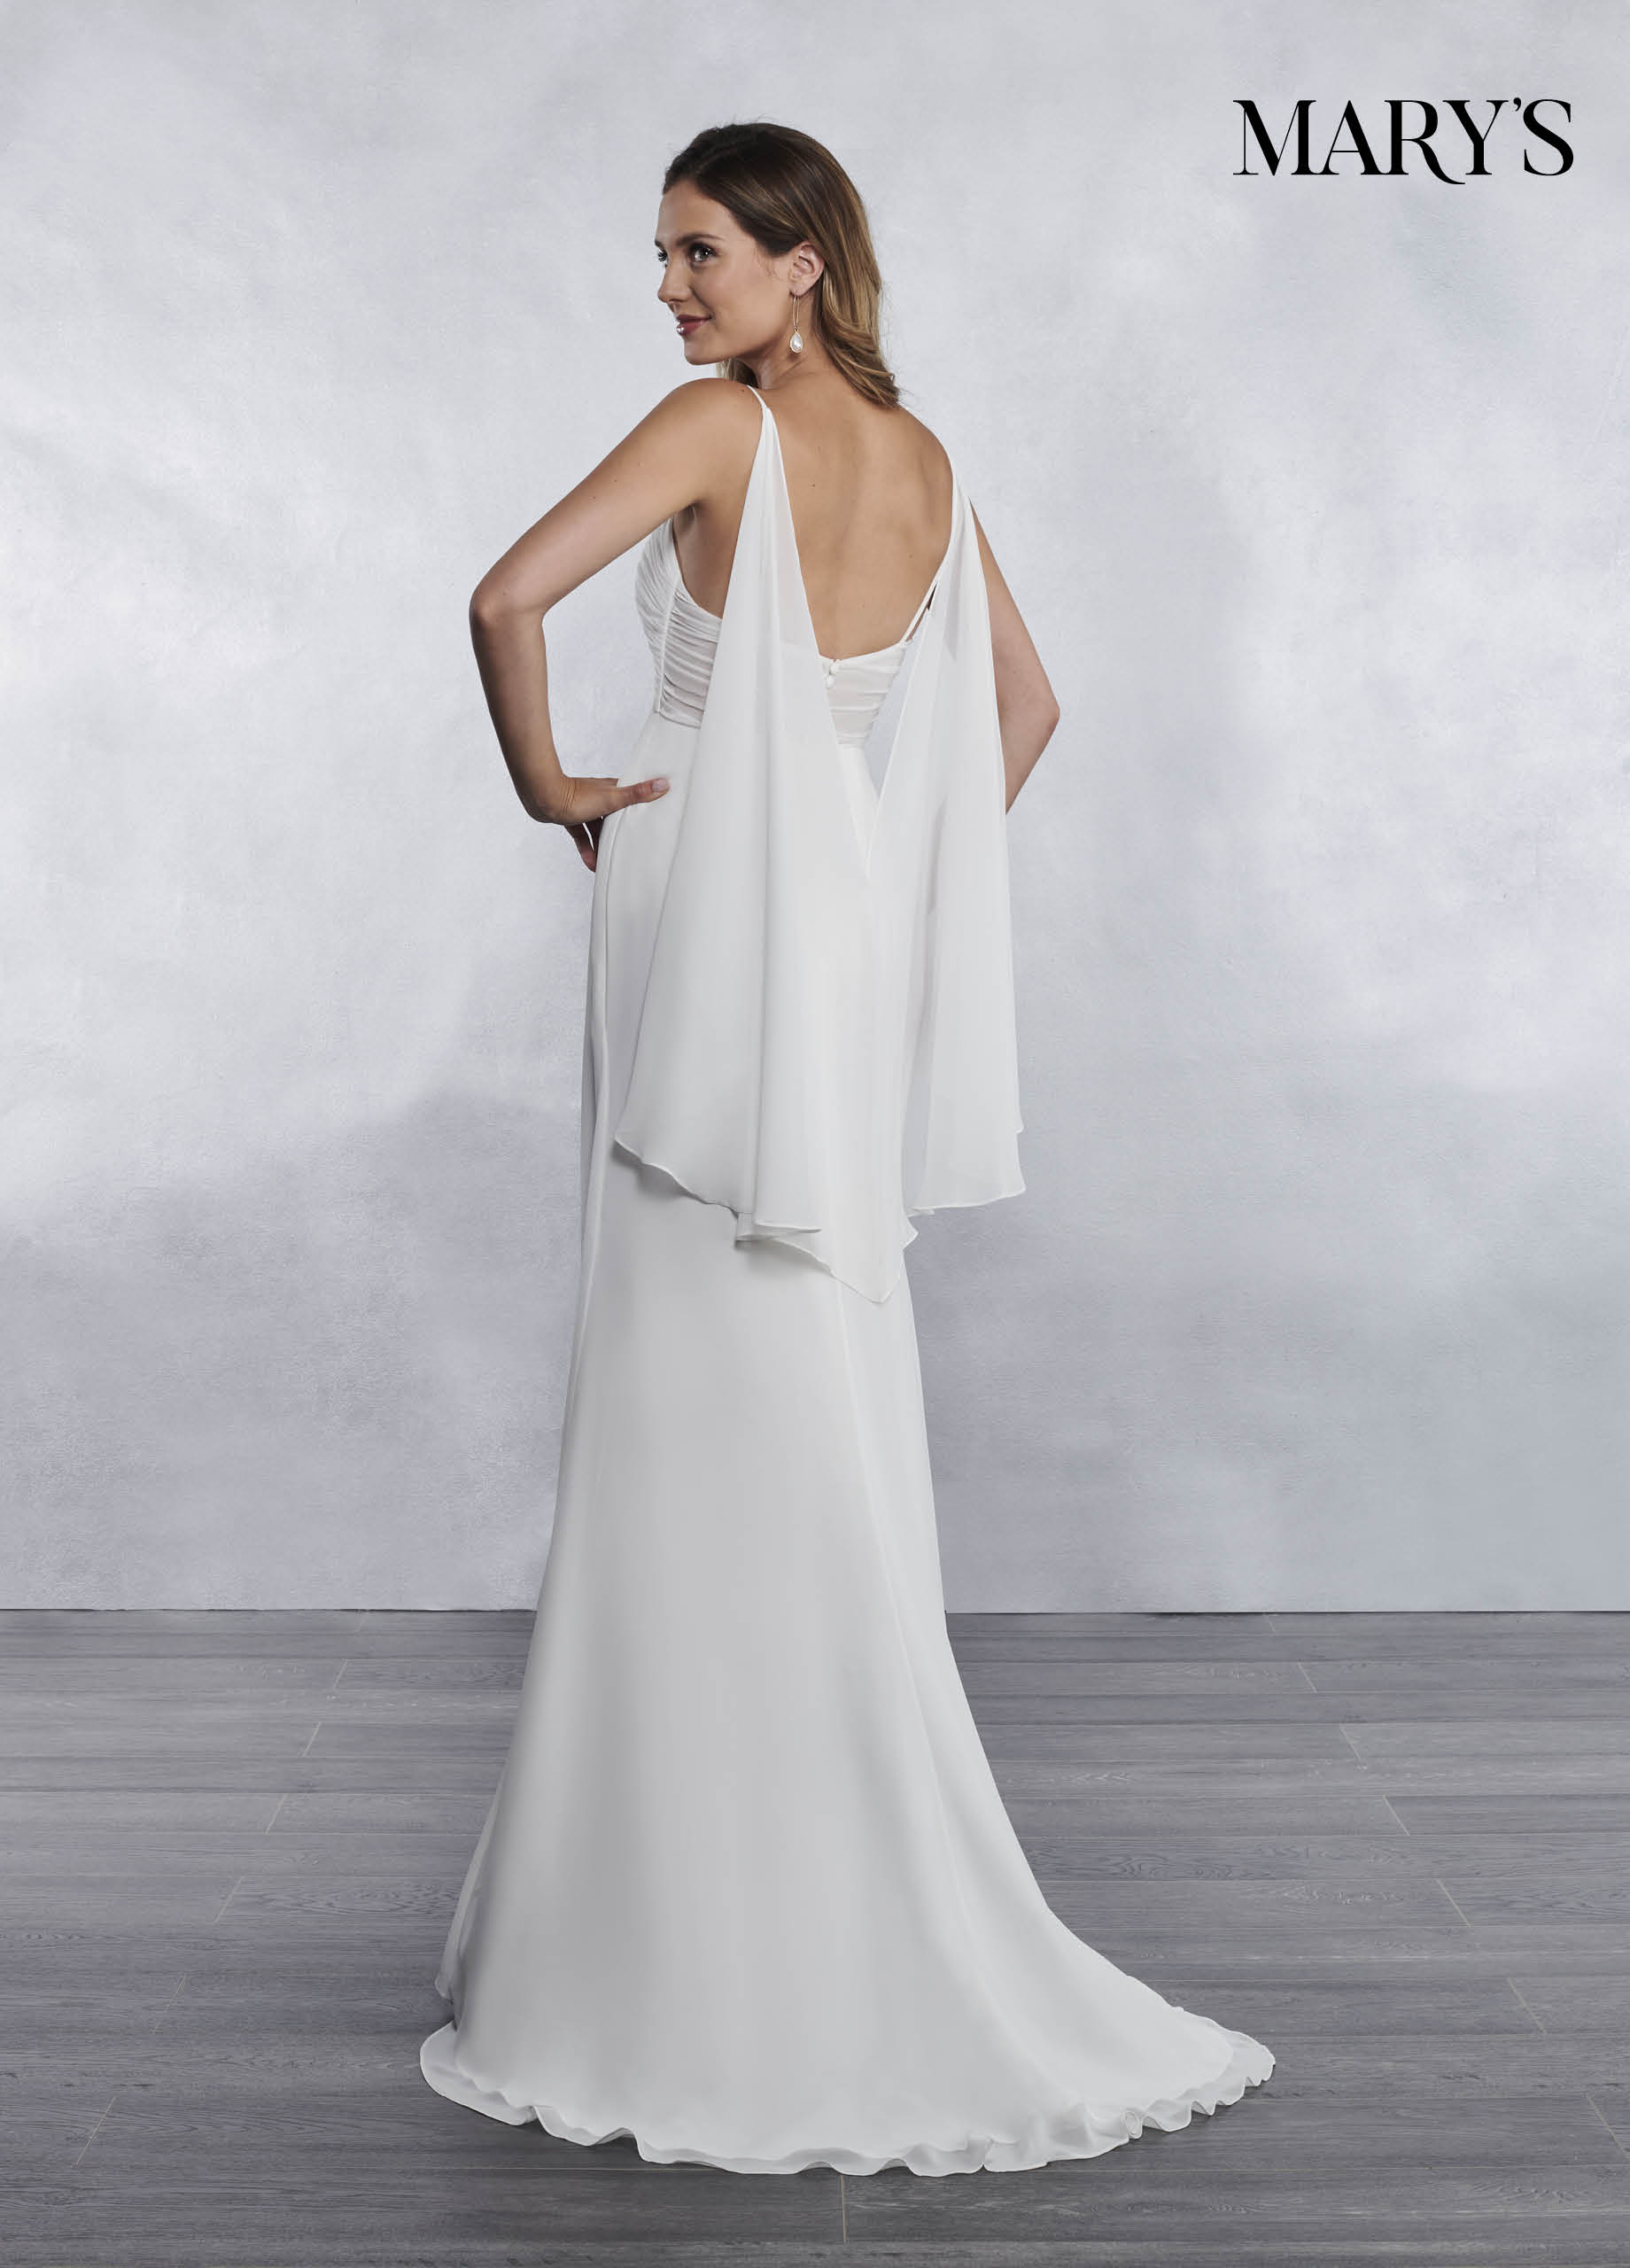 Bridal Wedding Dresses | Mary's | Style - MB1032